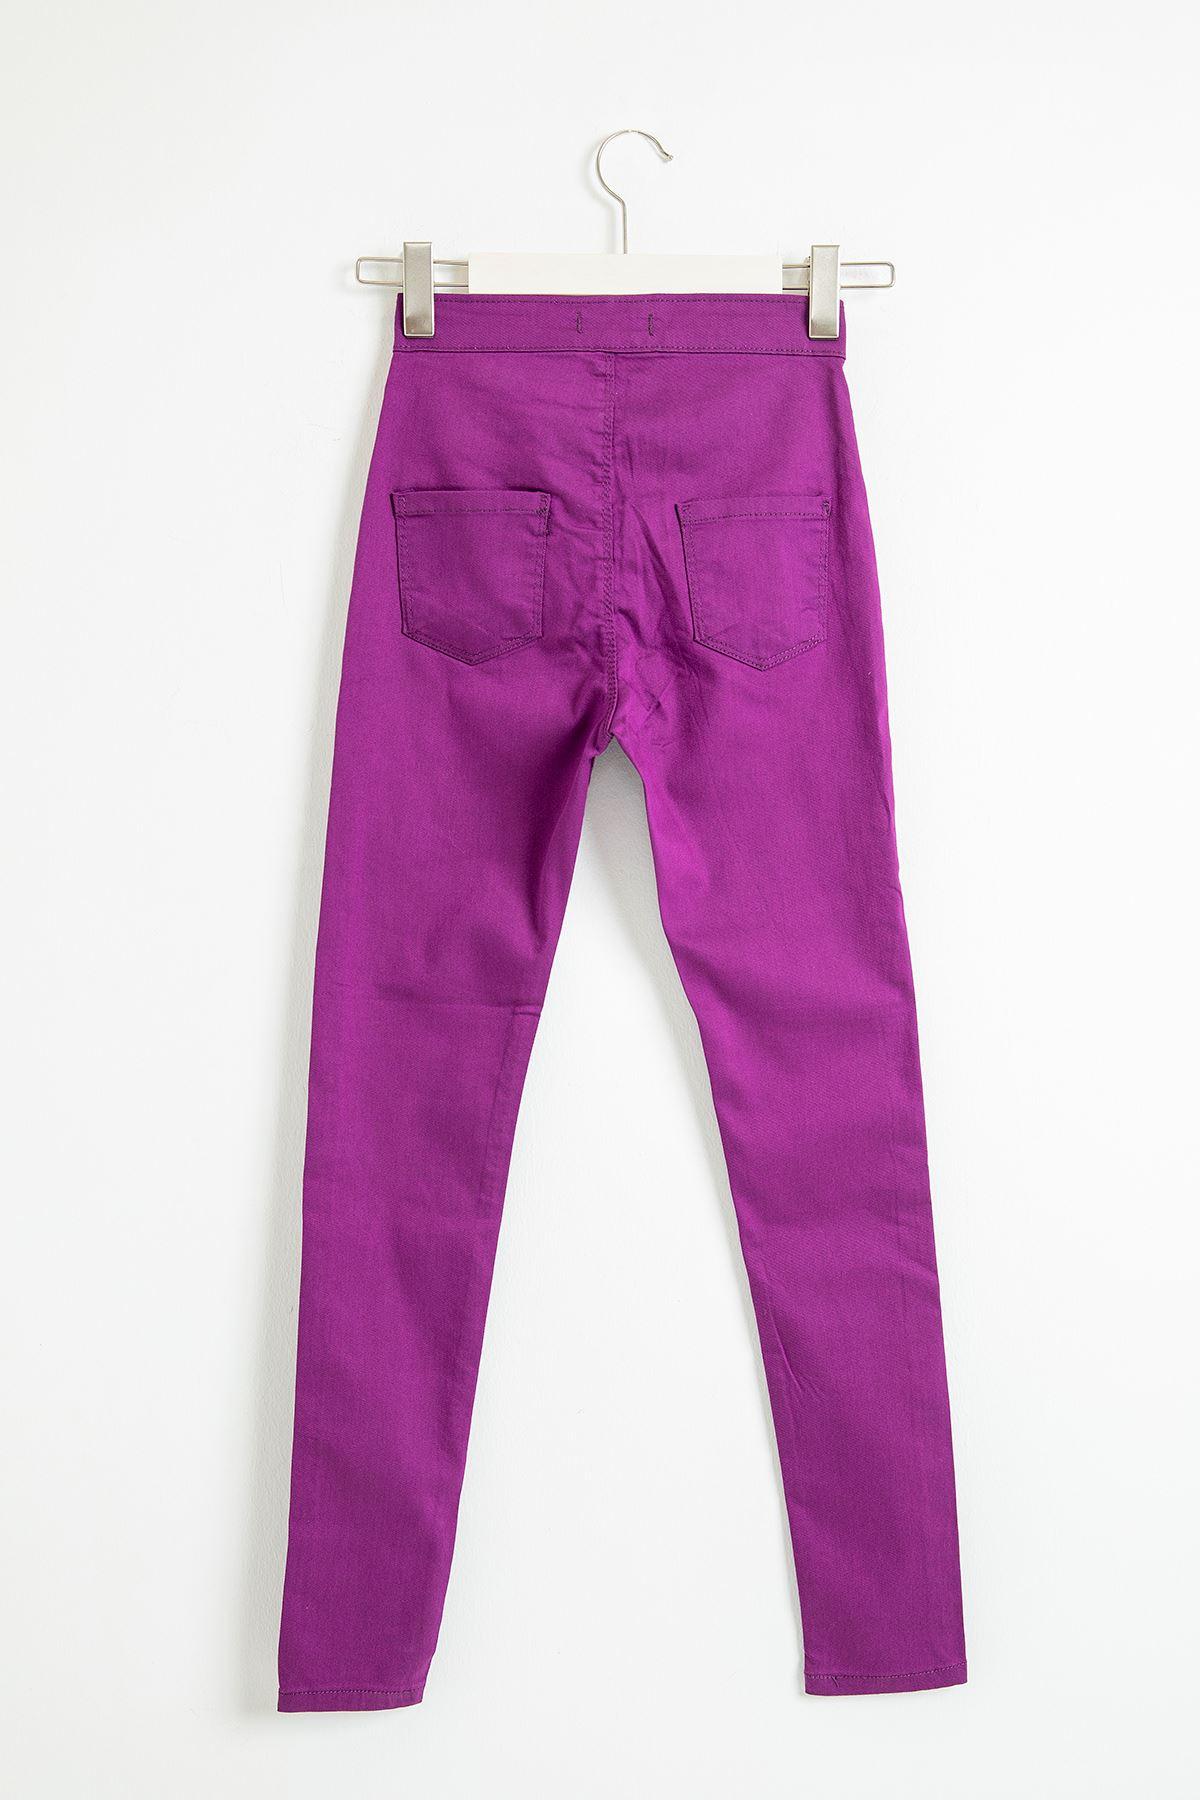 Cepsiz Düz Skinny Jean Pantolon-Mor